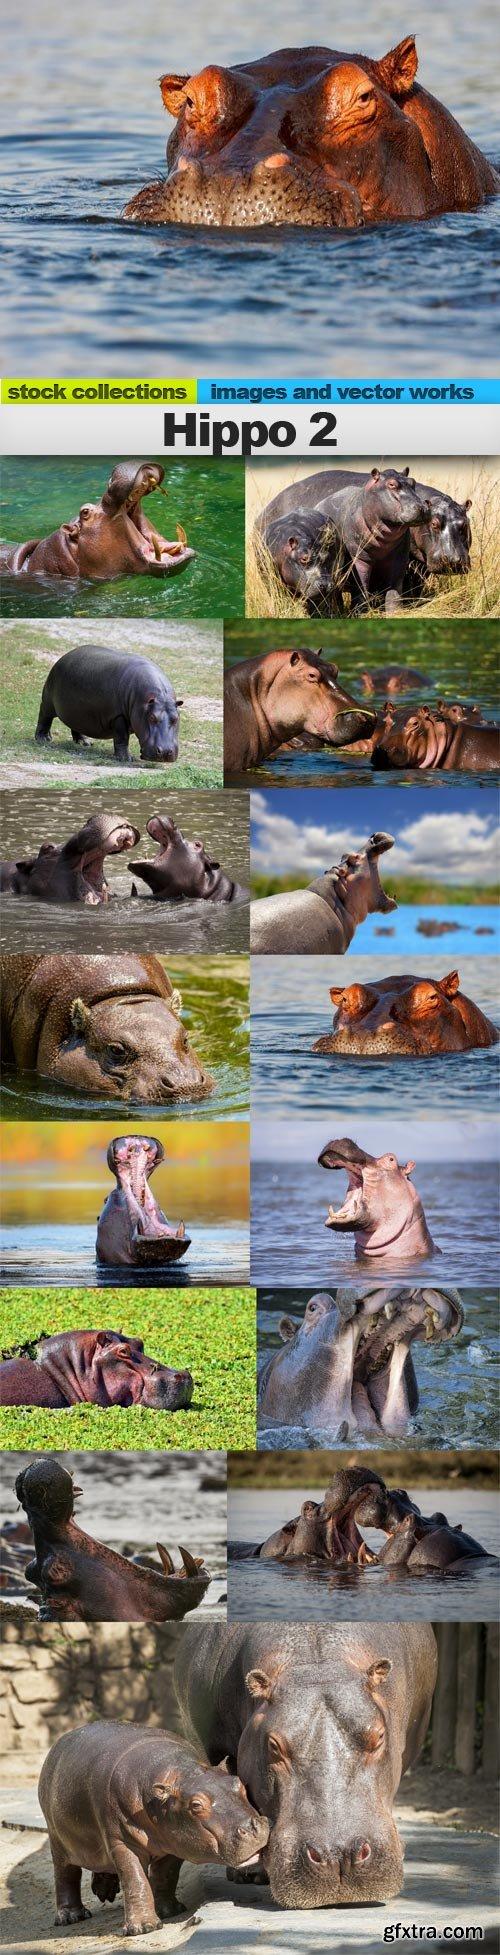 Hippo 2, 15 x UHQ JPEG